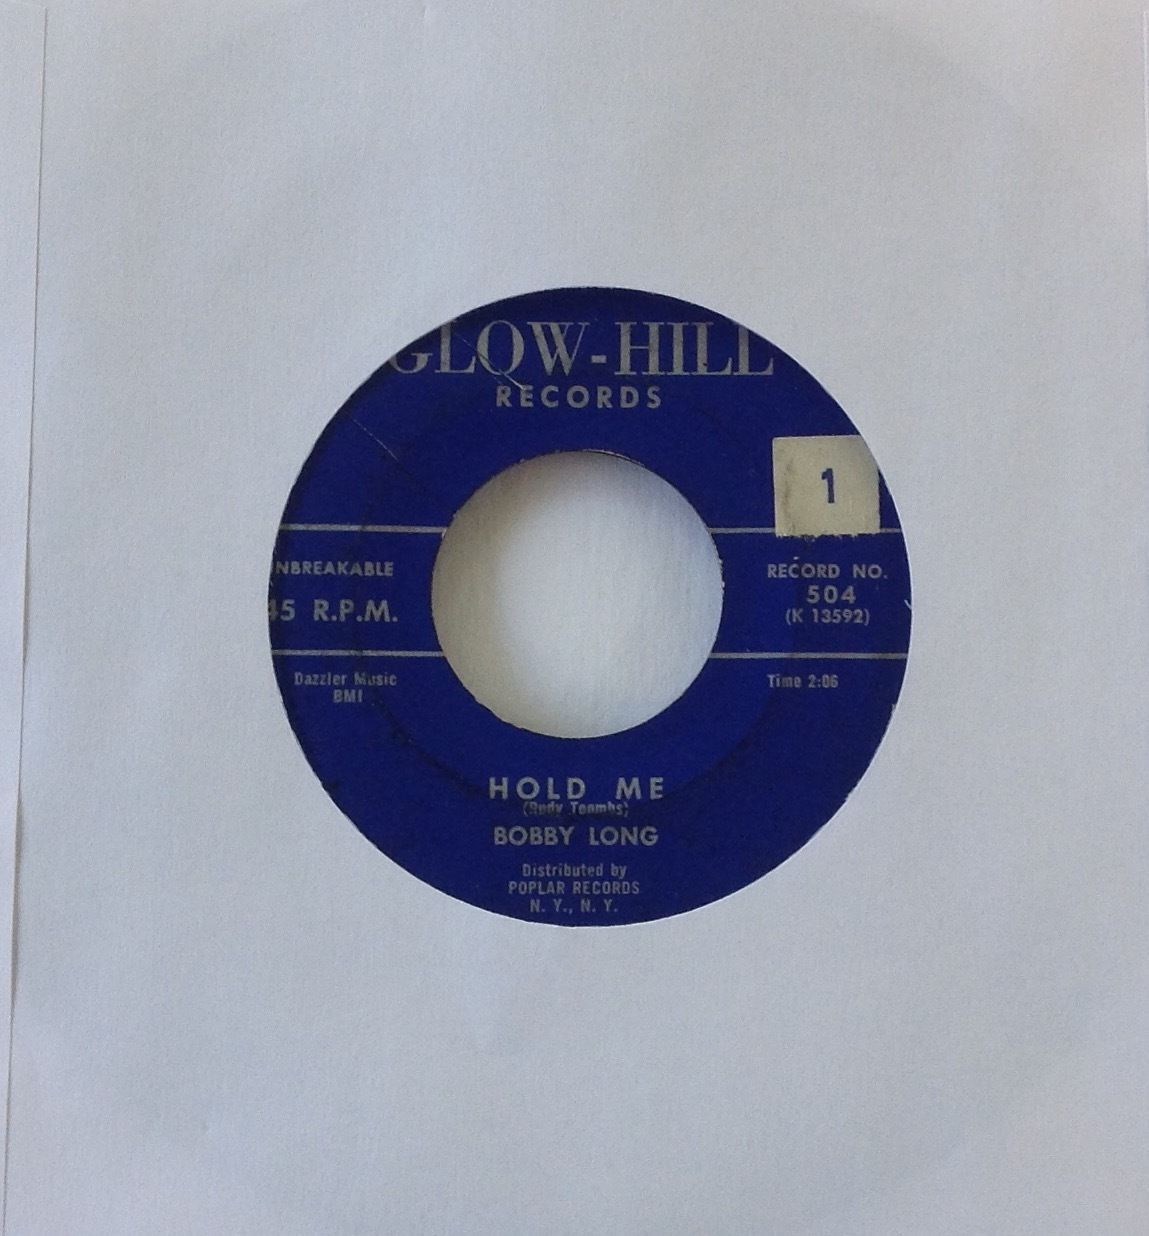 Bobby Long Hold Me Ooh La La 1958 Glow-Hill Records 504